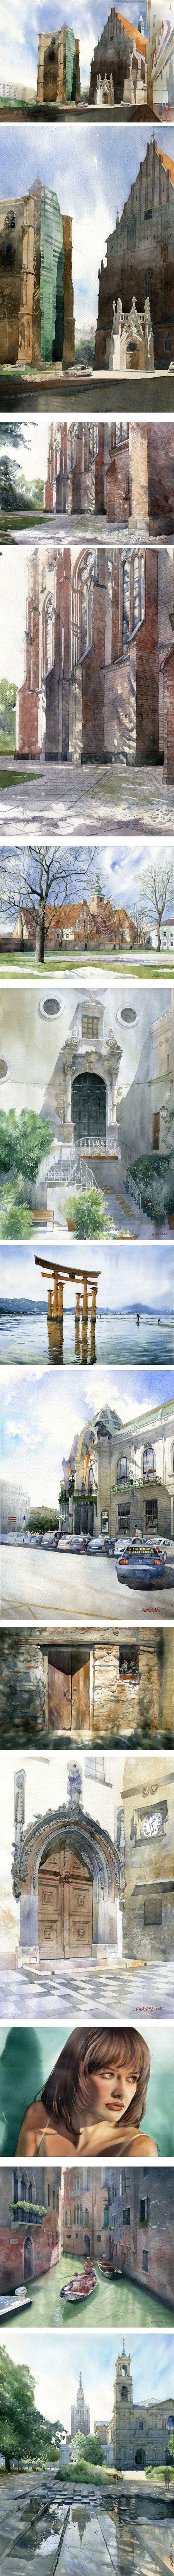 Grzegorz Wrobel, watercolor architectural rendering